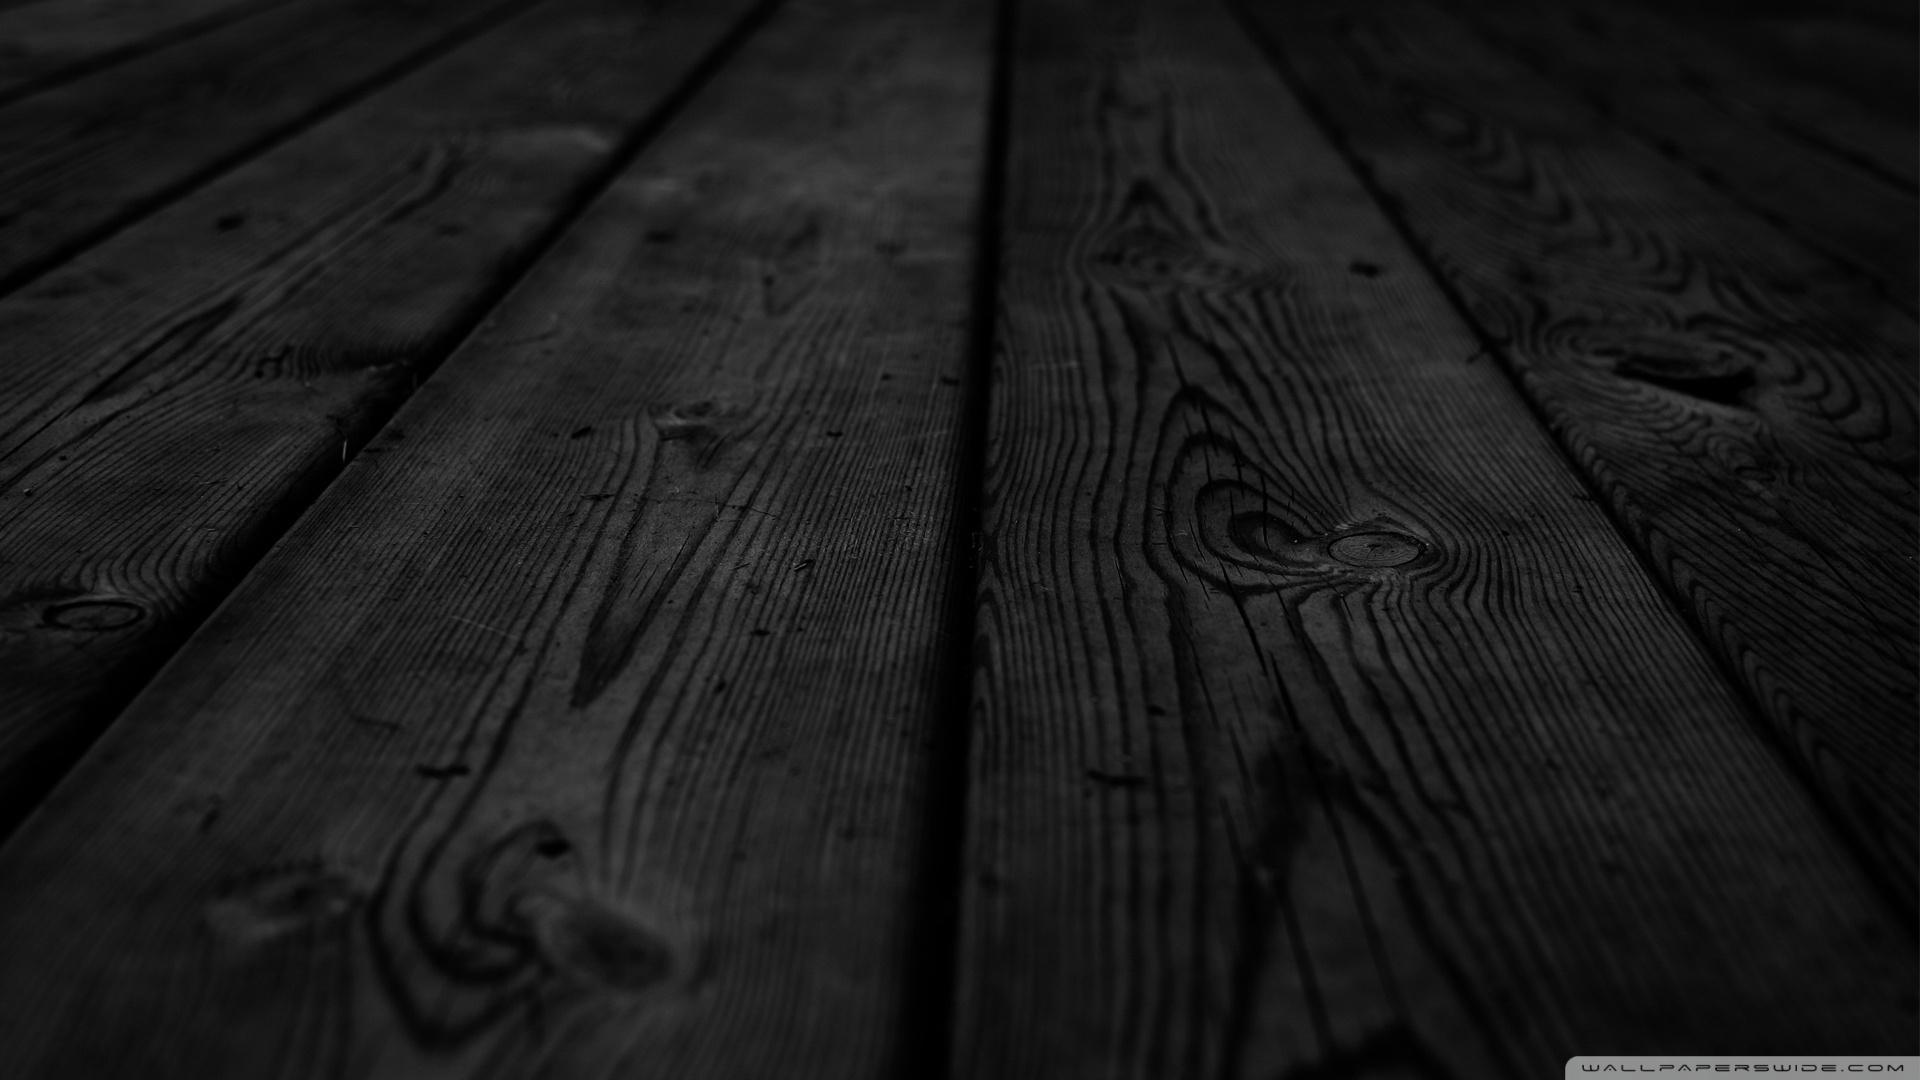 Black Wood 2 Wallpaper 1920x1080 Black  Wood  2. Hd Wood Wallpapers   wallpaper hd